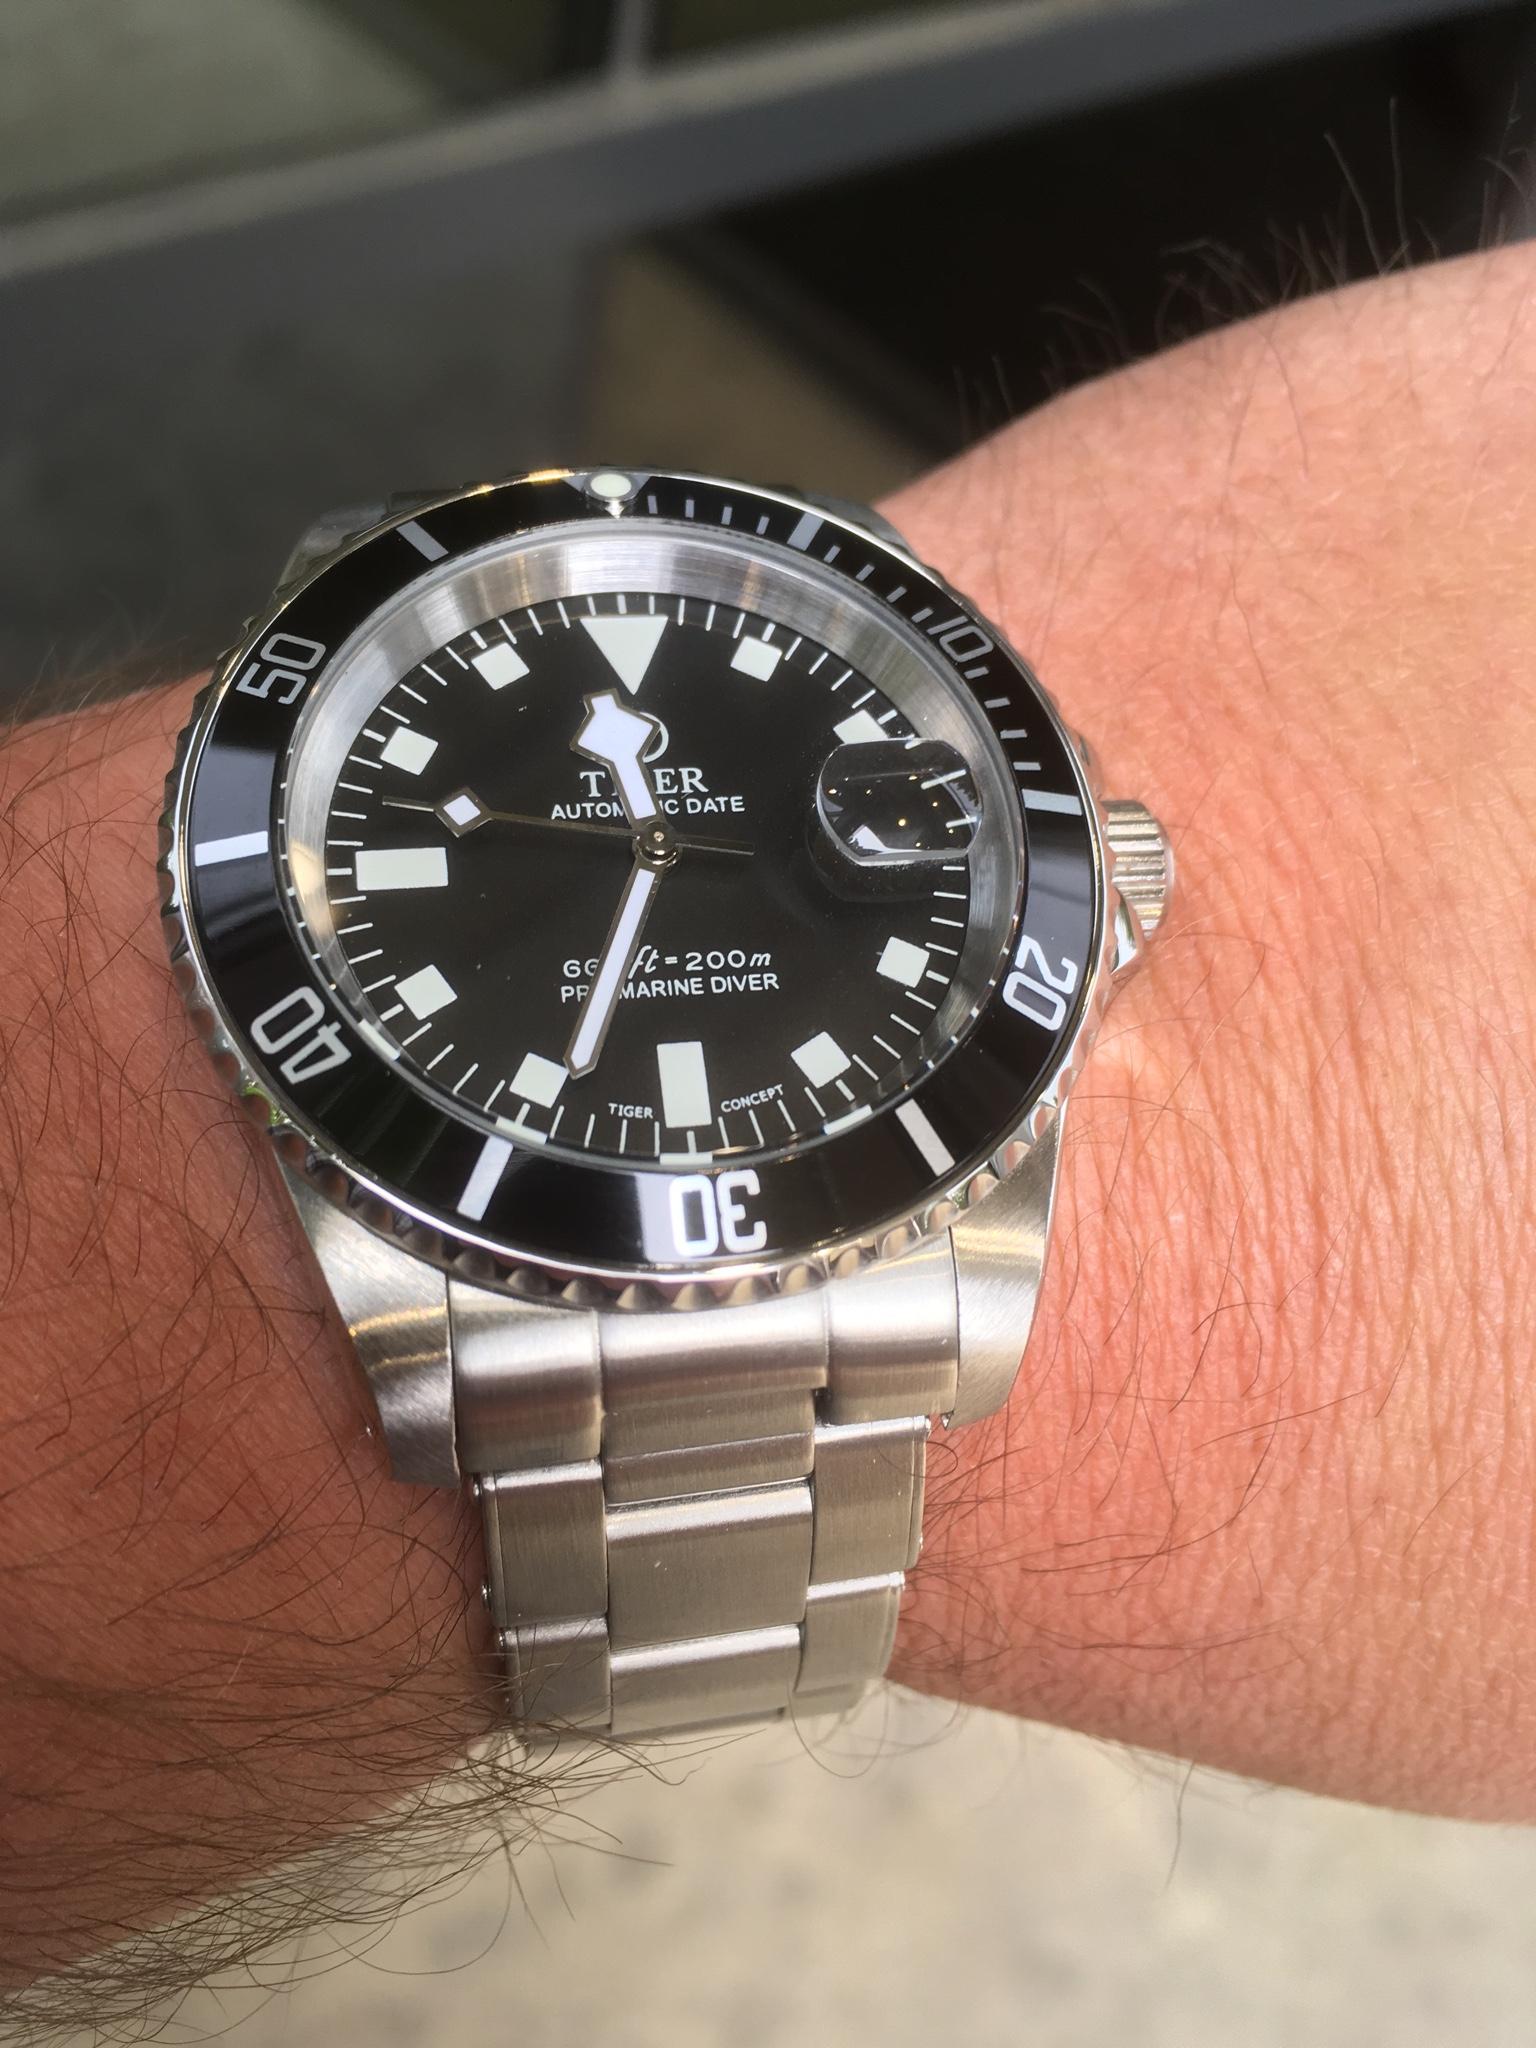 Tudor Pelagos 25600 TB Titanium Dive Watch Review ...